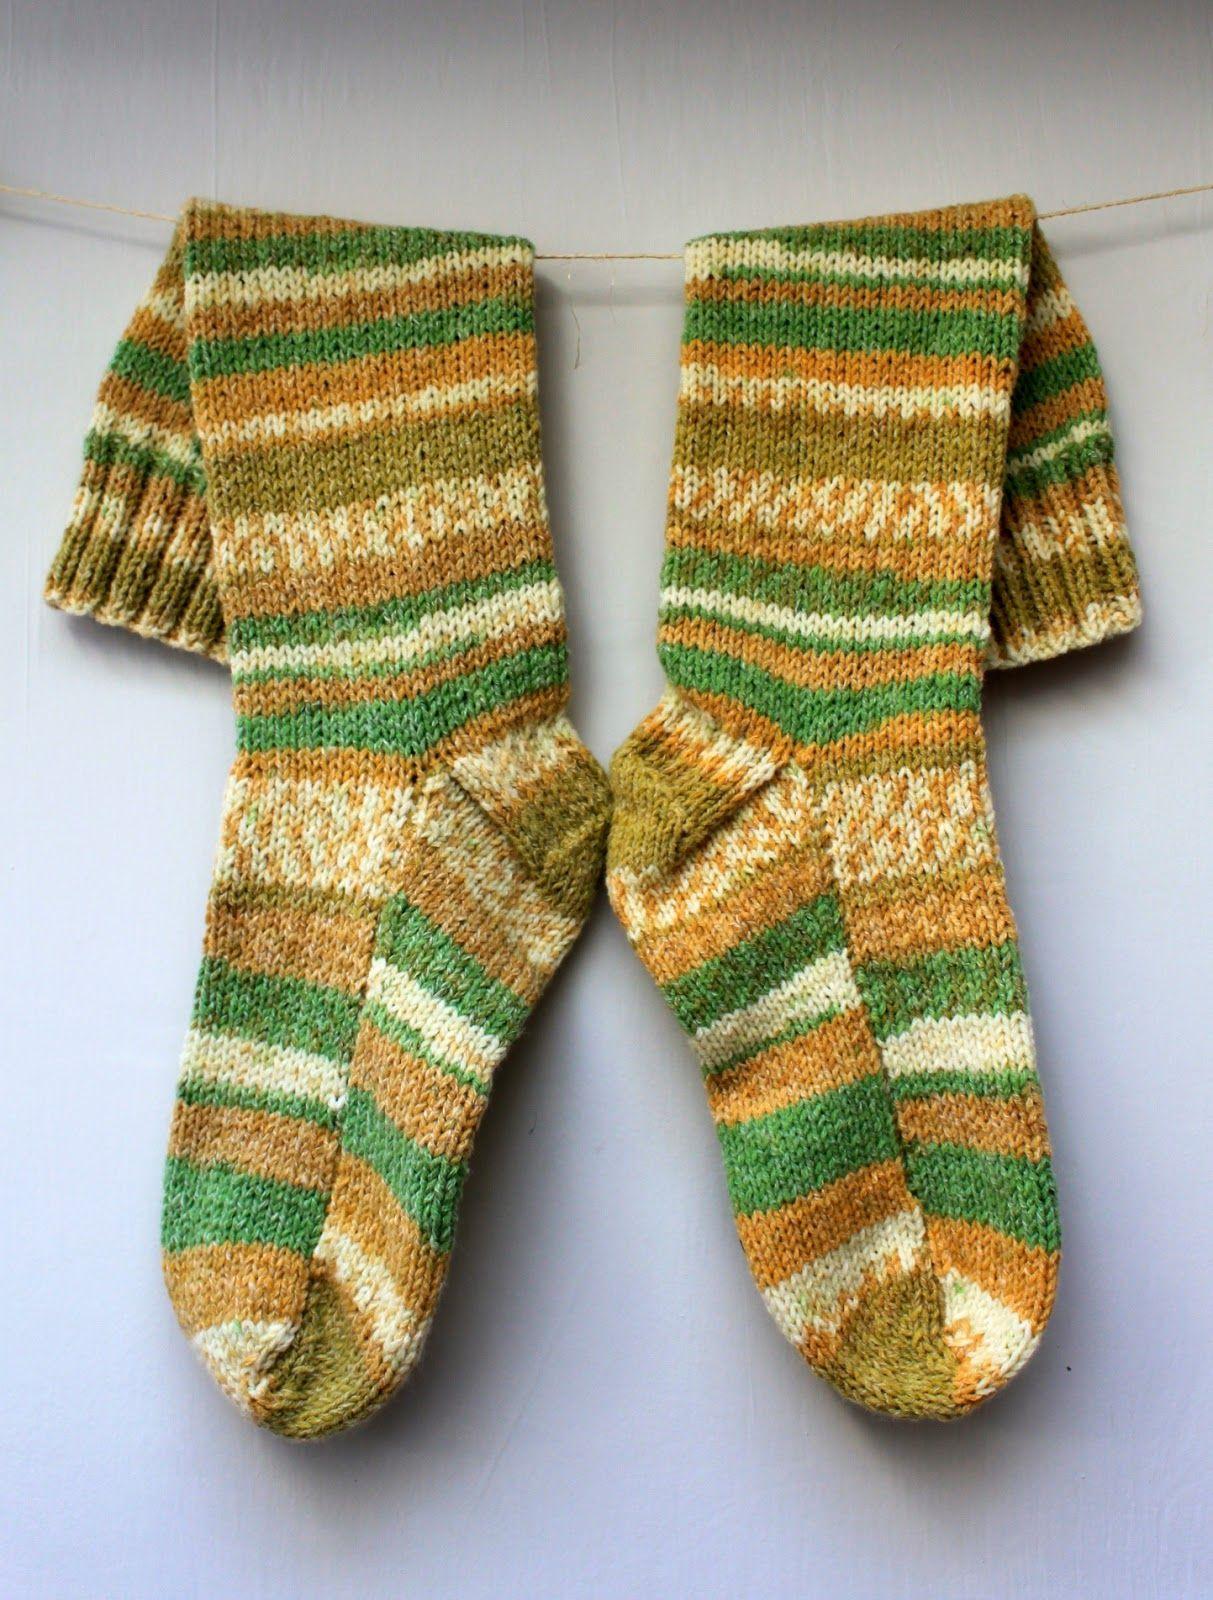 Hand Knitted Things: Sirdar Crofter DK Socks on Straight Needles ...